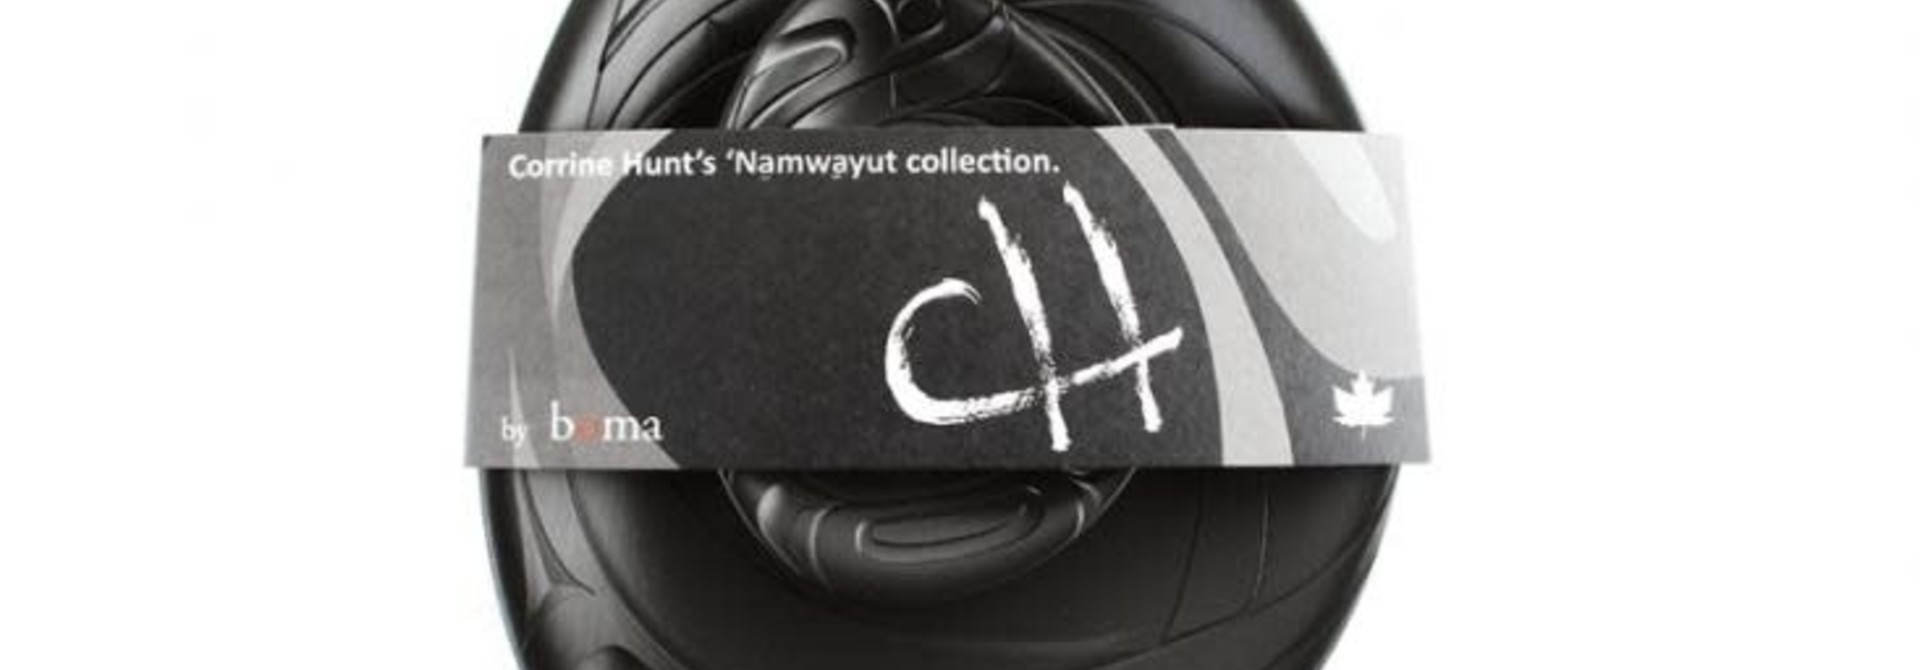 Namwayut Free Form Bowl Set - Black by Corrine Hunt